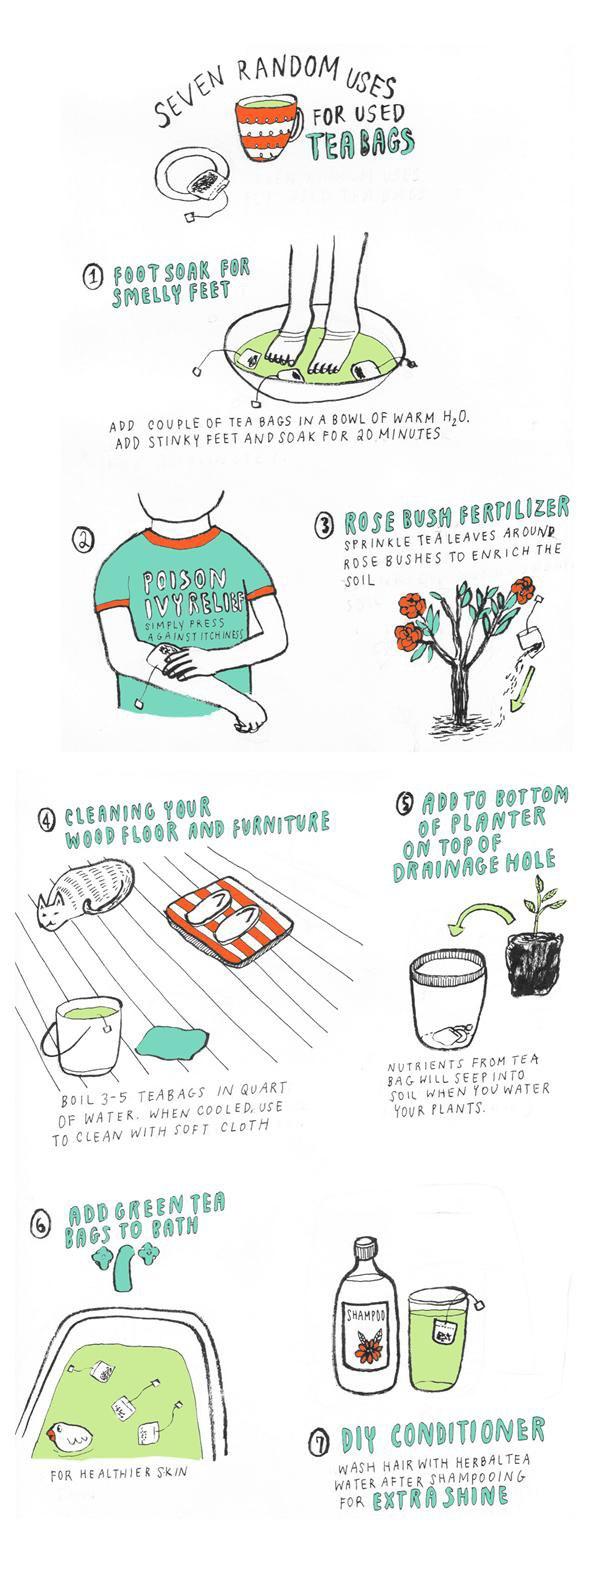 7 random uses for used tea bags the secret yumiverse - Uses for tea bags ...